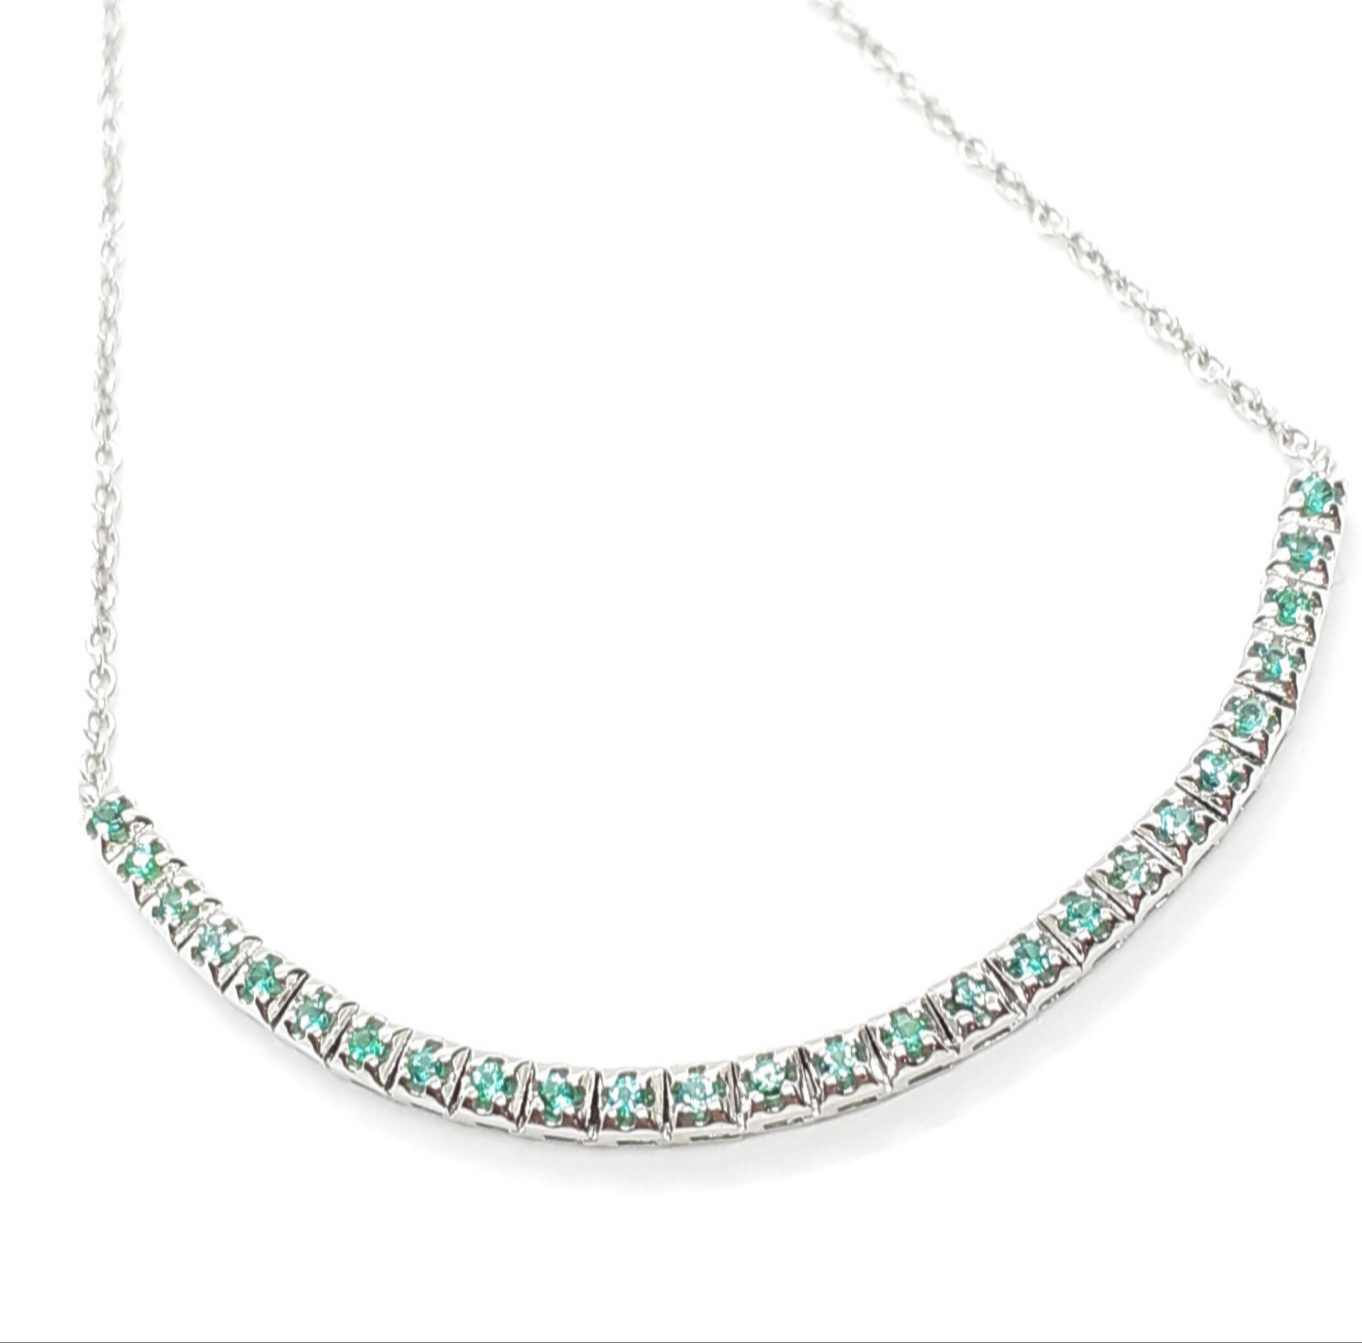 Sensi joyas jewellery Granada silver engagementEMERALD BRACELET